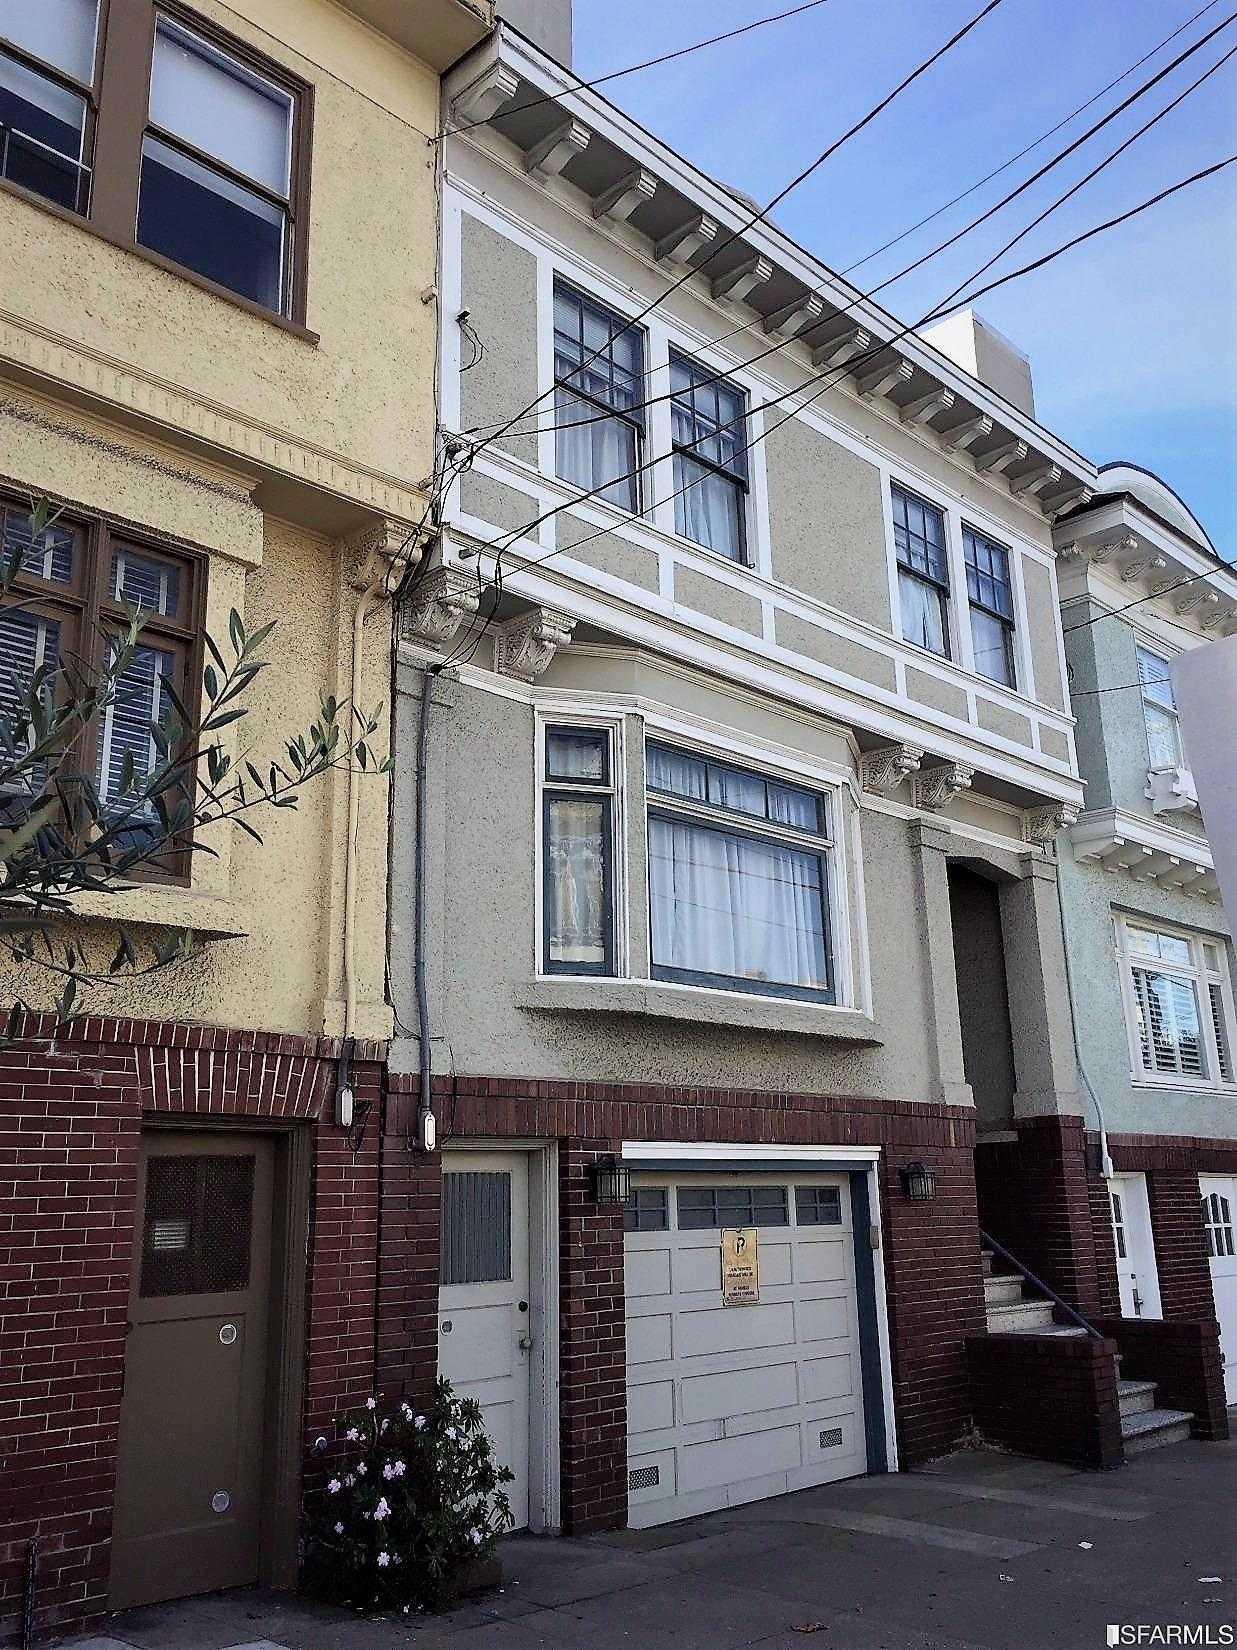 275 9th Ave San Francisco, CA 94118